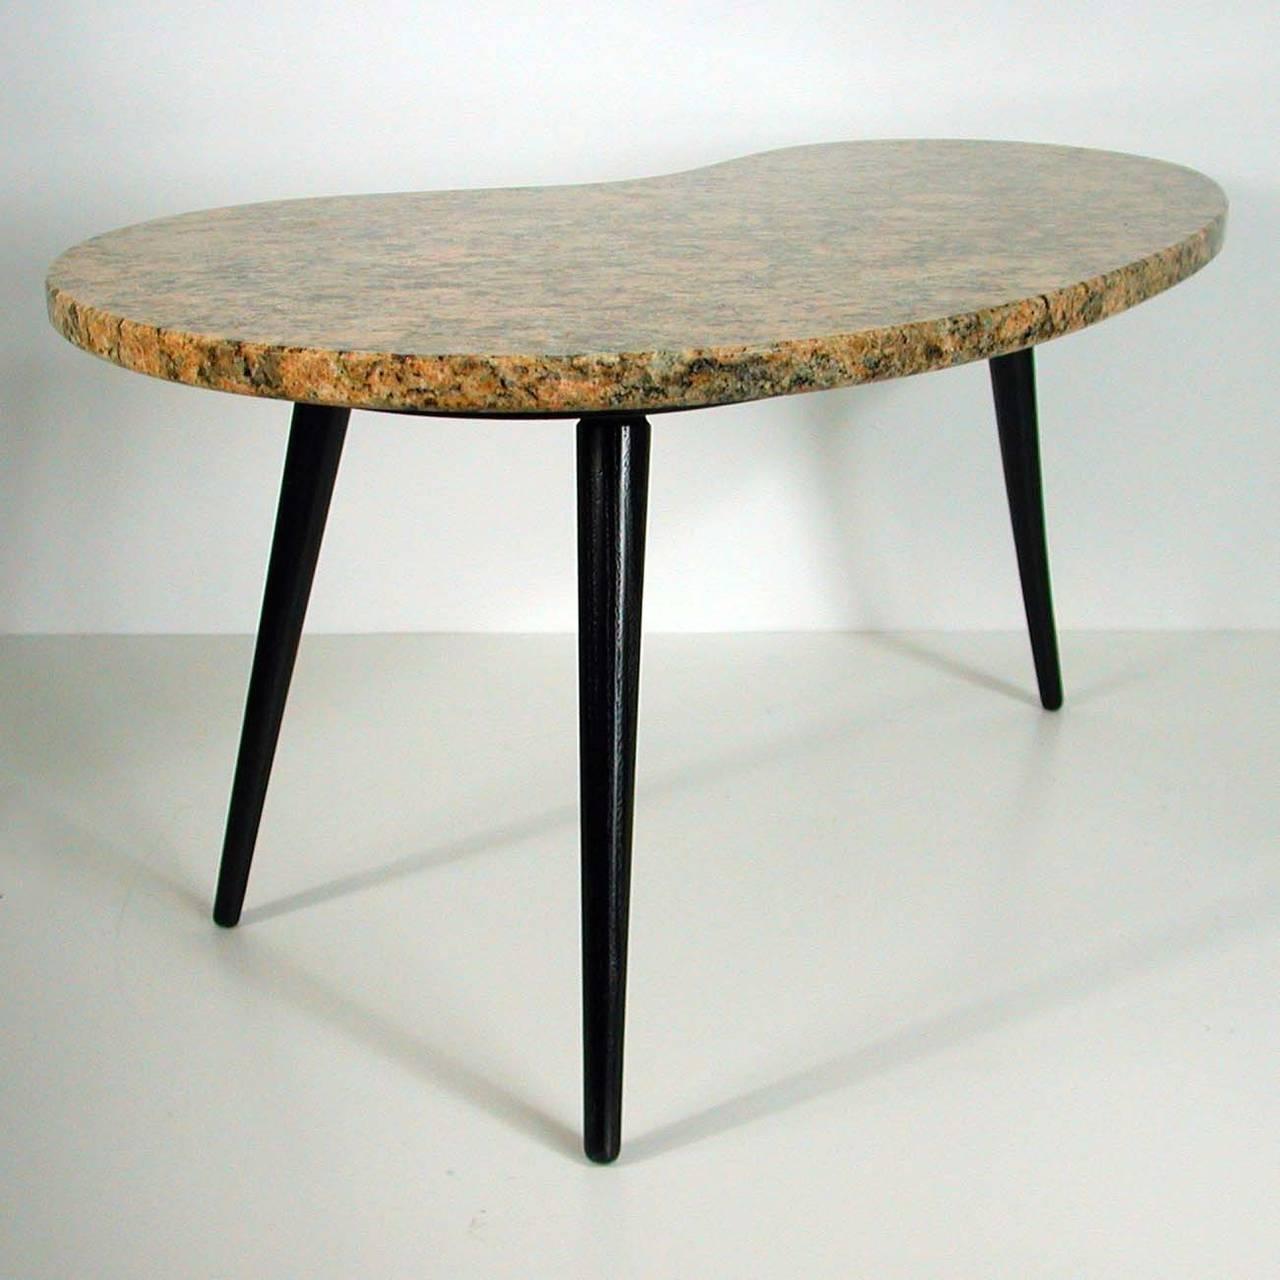 Marble Kidney Coffee Table: 1950s Italian Kidney-Shaped Giallo Venetia, Marble Side Or